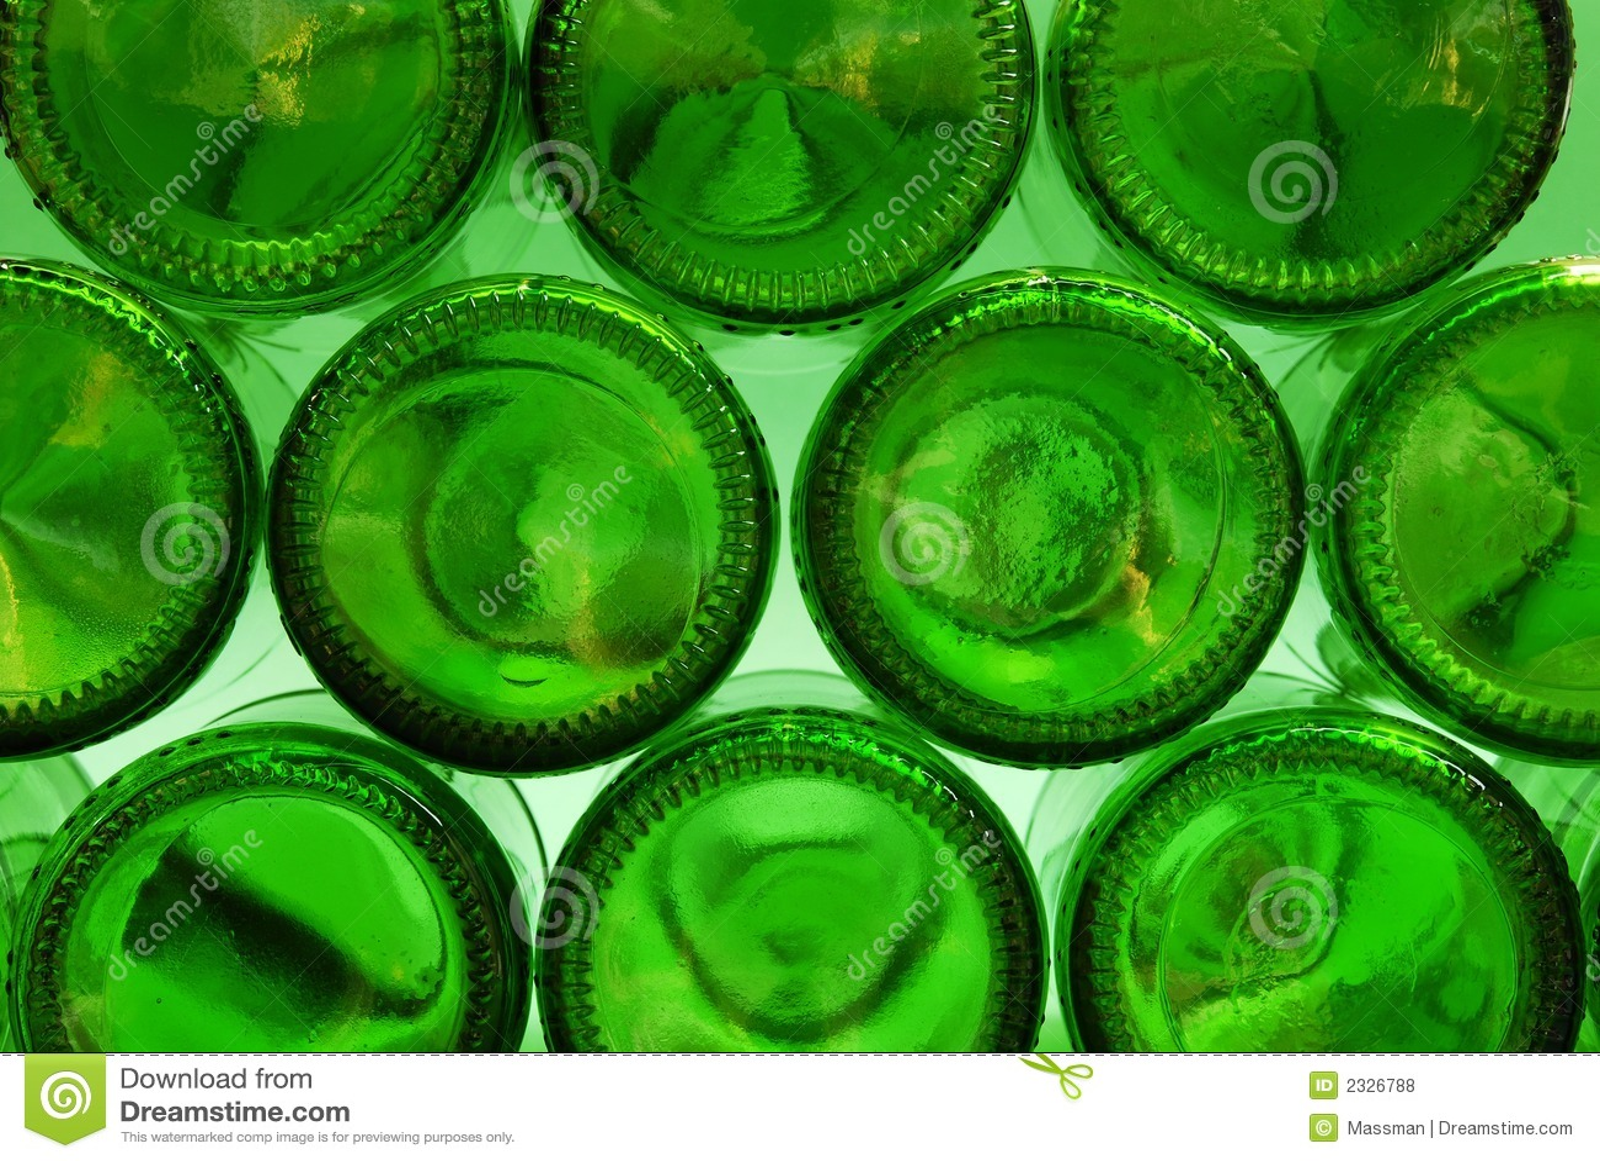 Green bottle bottoms stock photo image of circles empty for How to break bottom of glass bottle